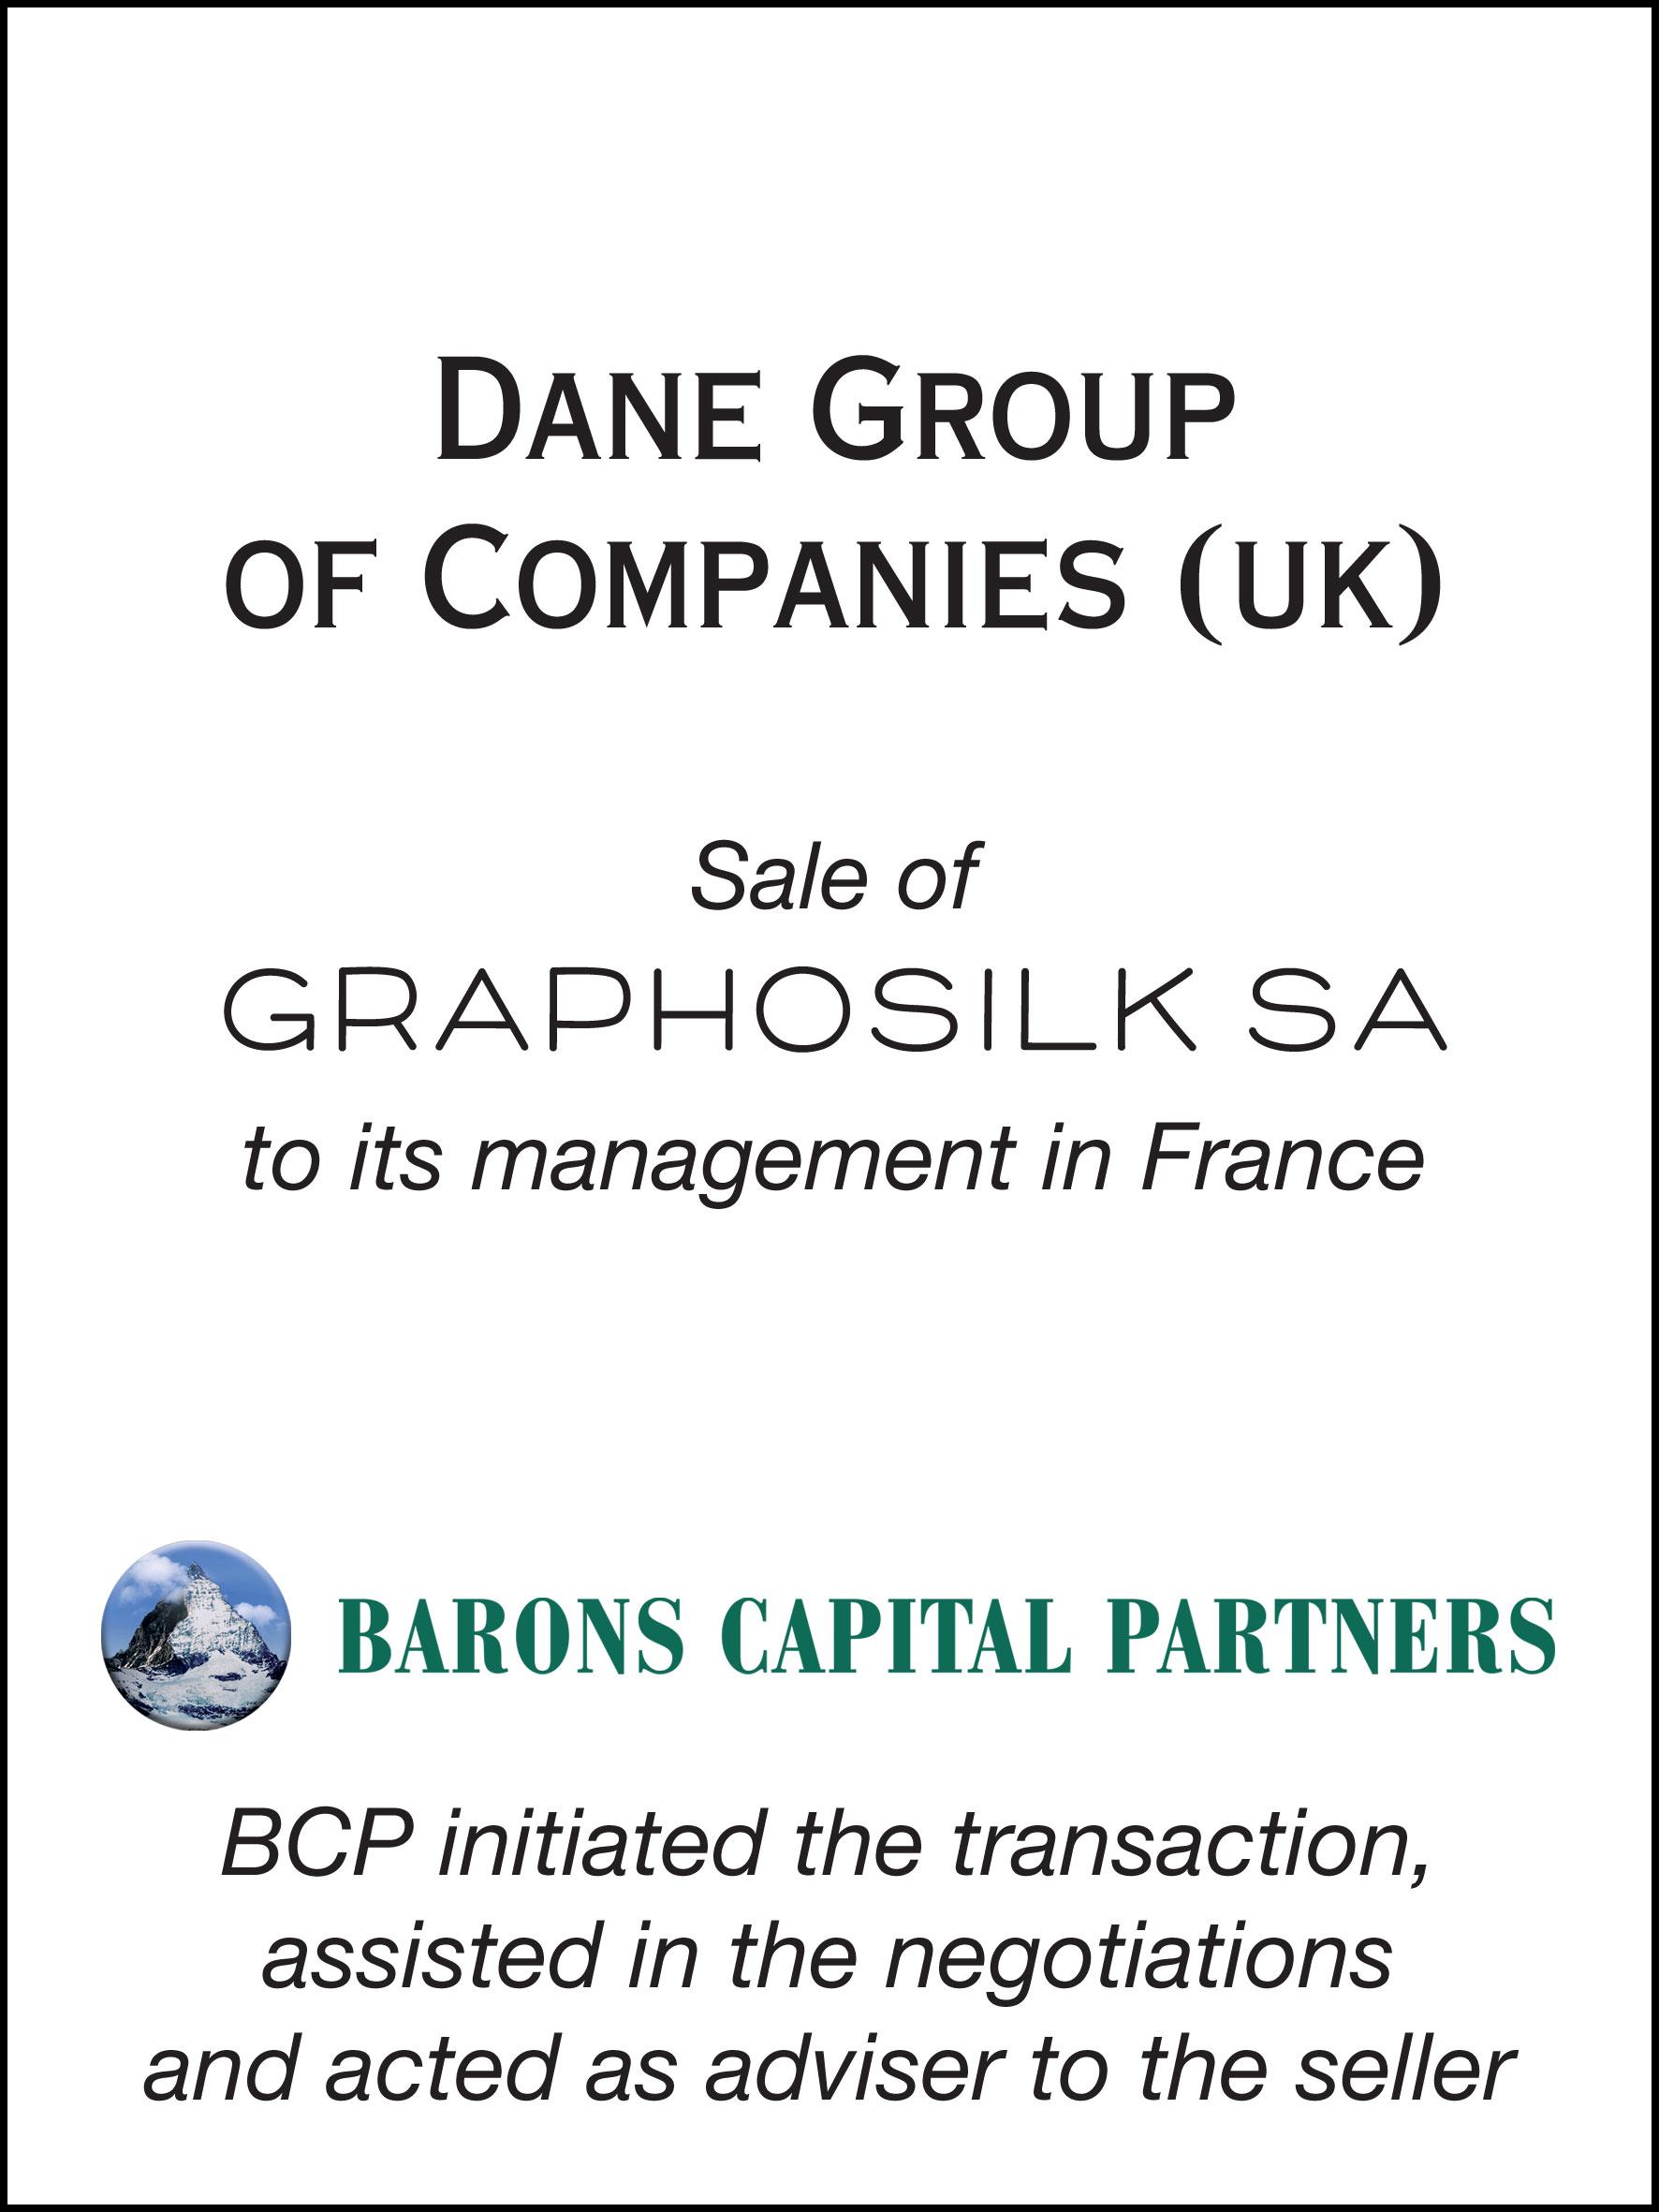 23_Dane Group of Companies (UK)